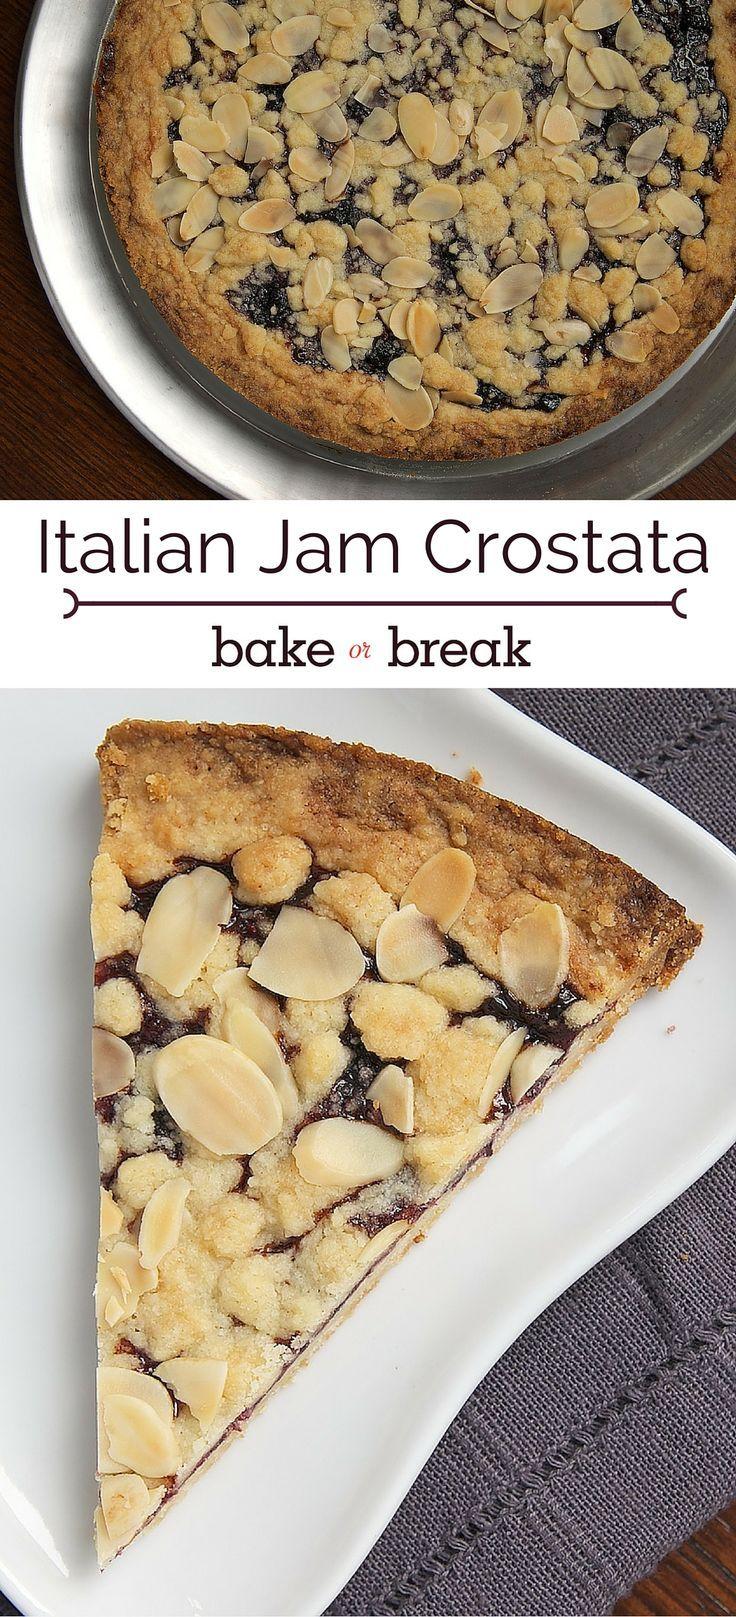 Italian Jam Crostata is wonderfully delicious and so simple to make. A great last-minute dessert! ~ http://www.bakeorbreak.com